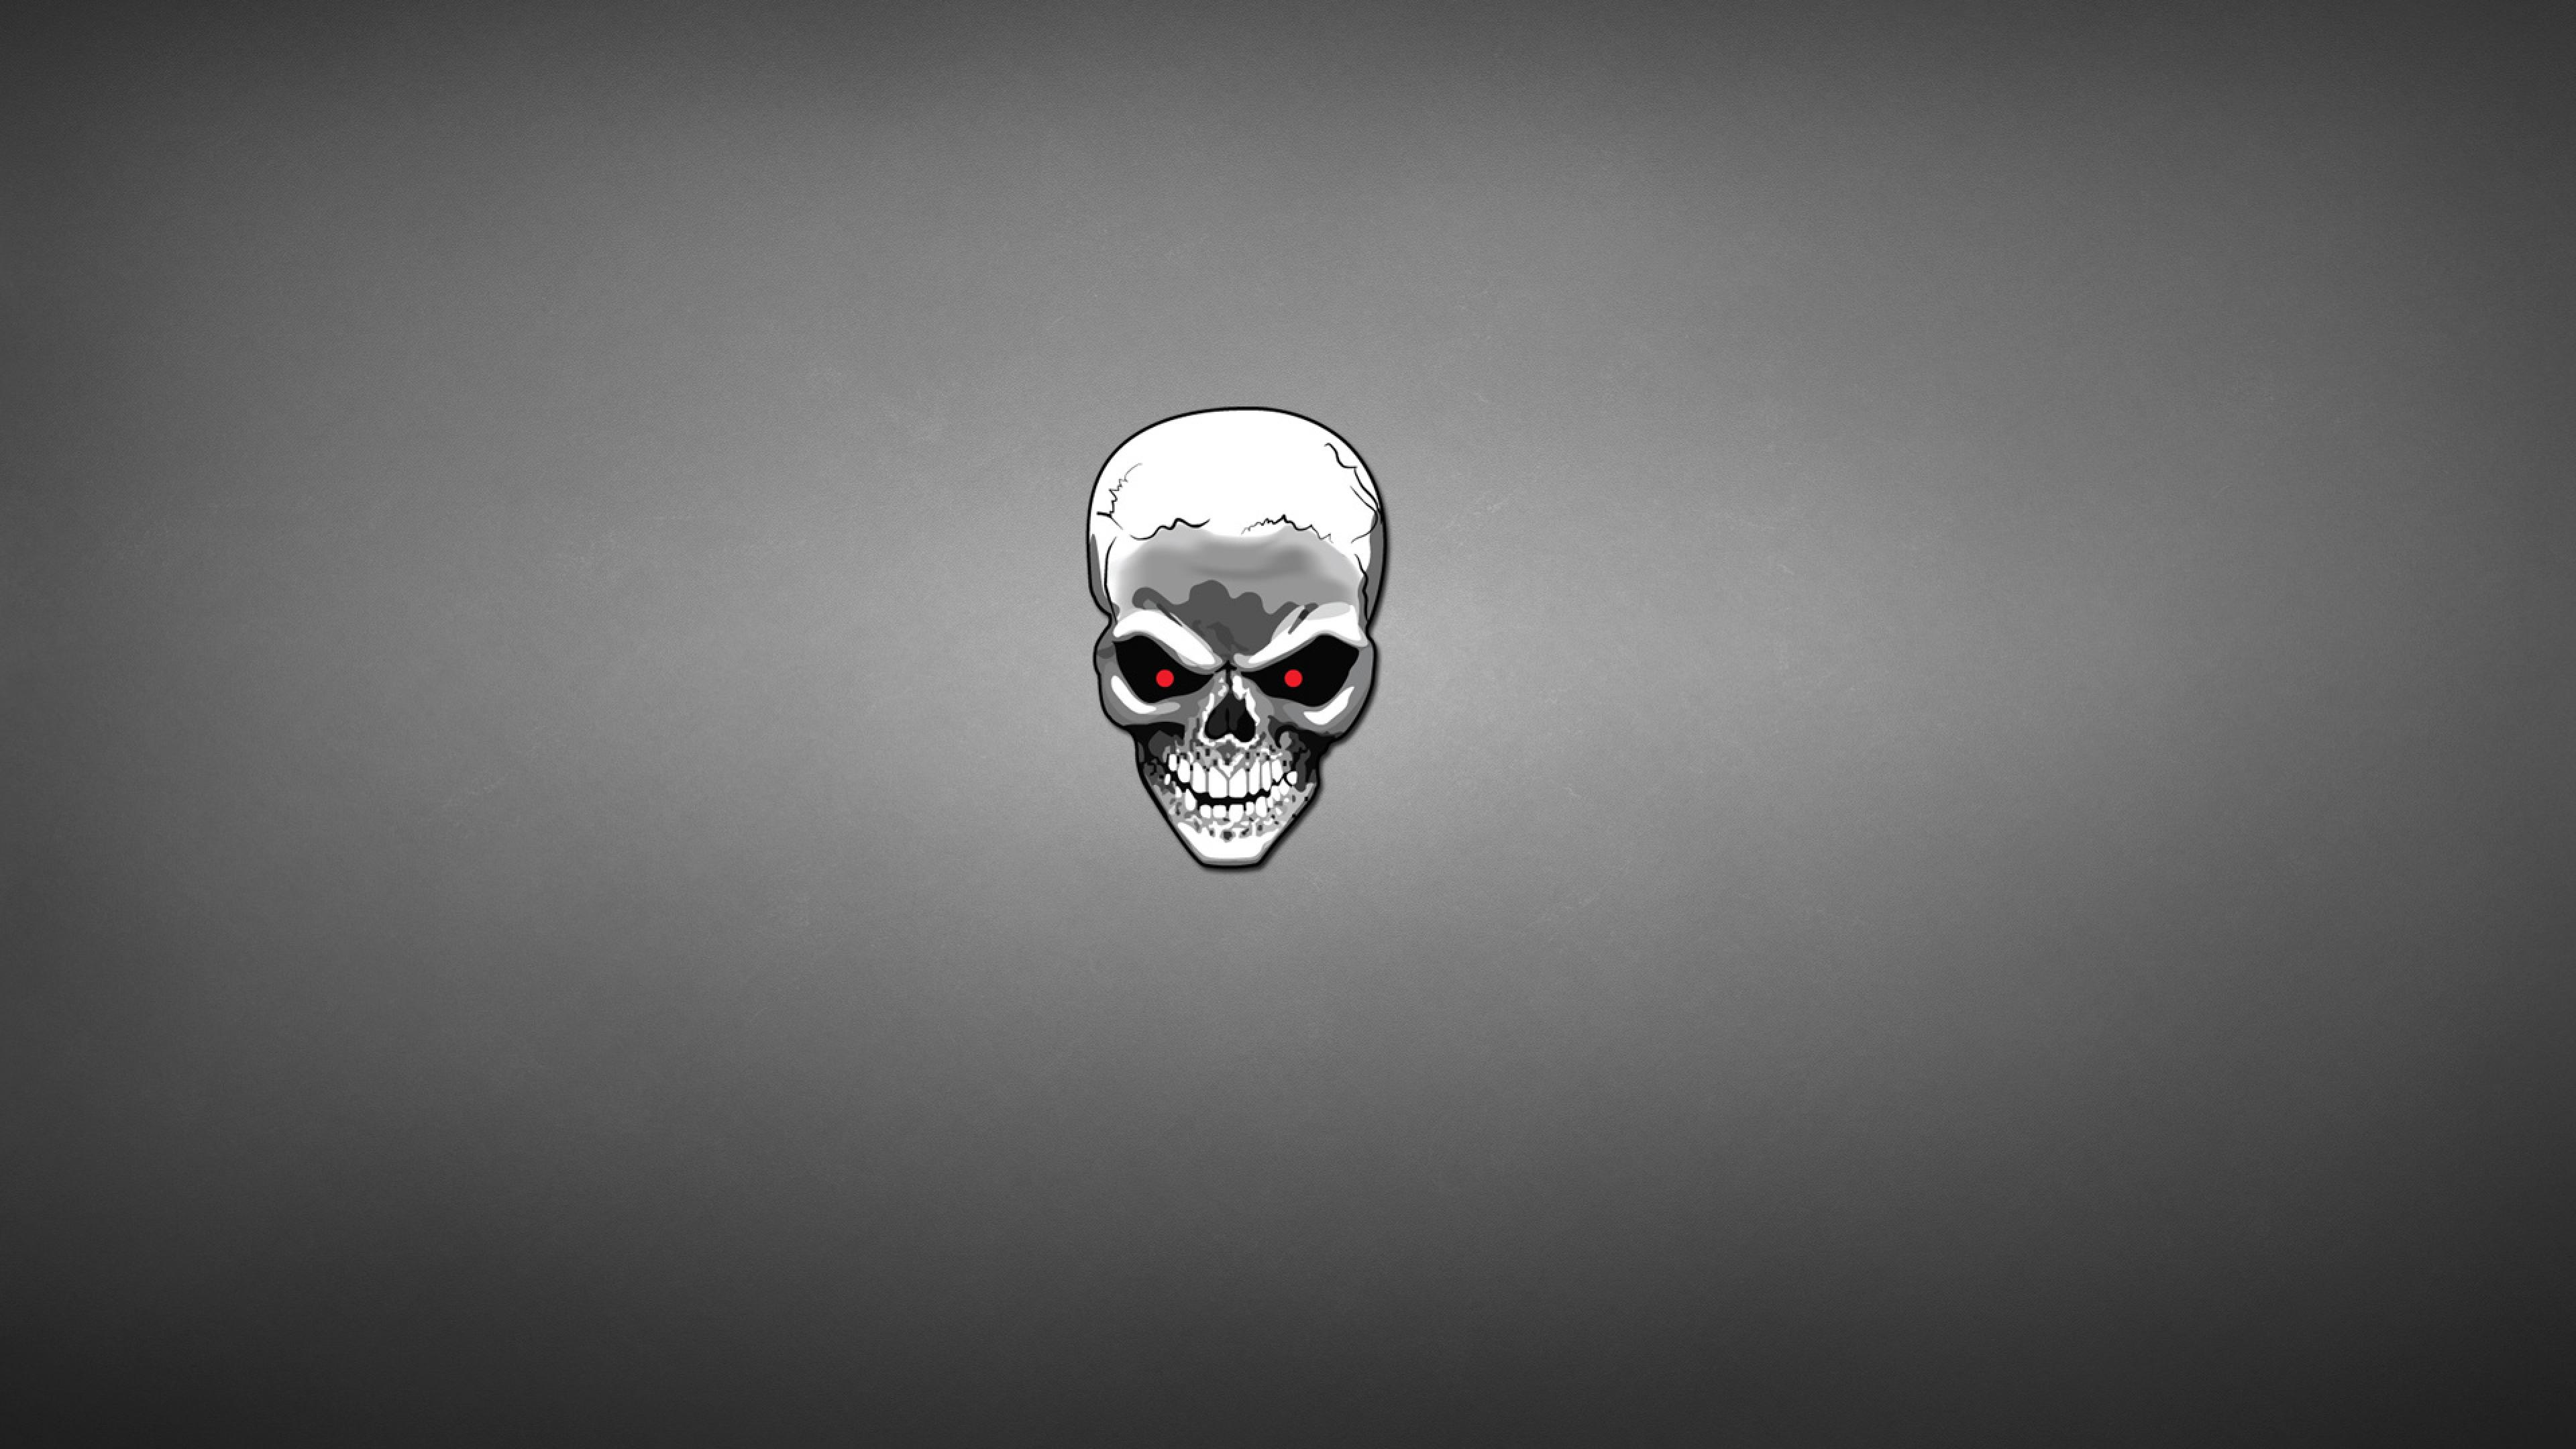 skull art 2 4k 1540748306 - Skull Art 2 4k - skull wallpapers, minimalism wallpapers, digital art wallpapers, artist wallpapers, art wallpapers